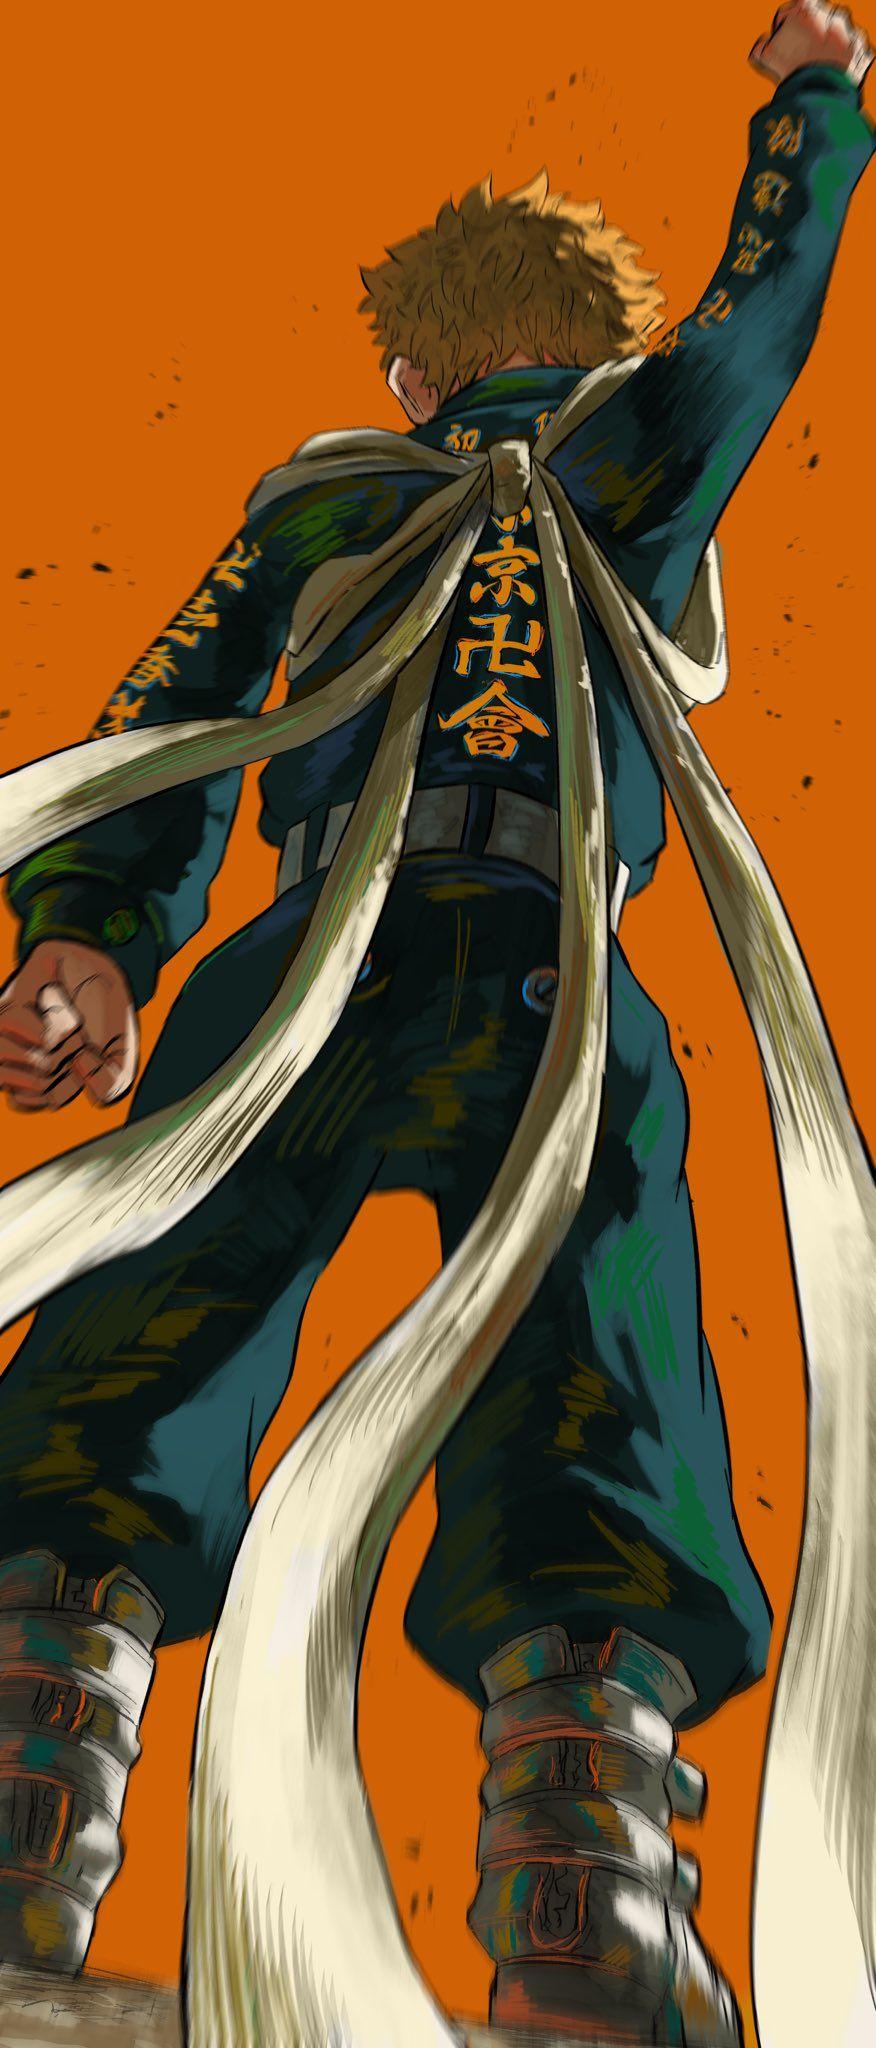 Please beware of manga spoilers‼️ tokyo revengers manga chapter224 catmanga.org/series/tr/224. あらきん on Twitter | Best anime shows, Animated wallpapers ...